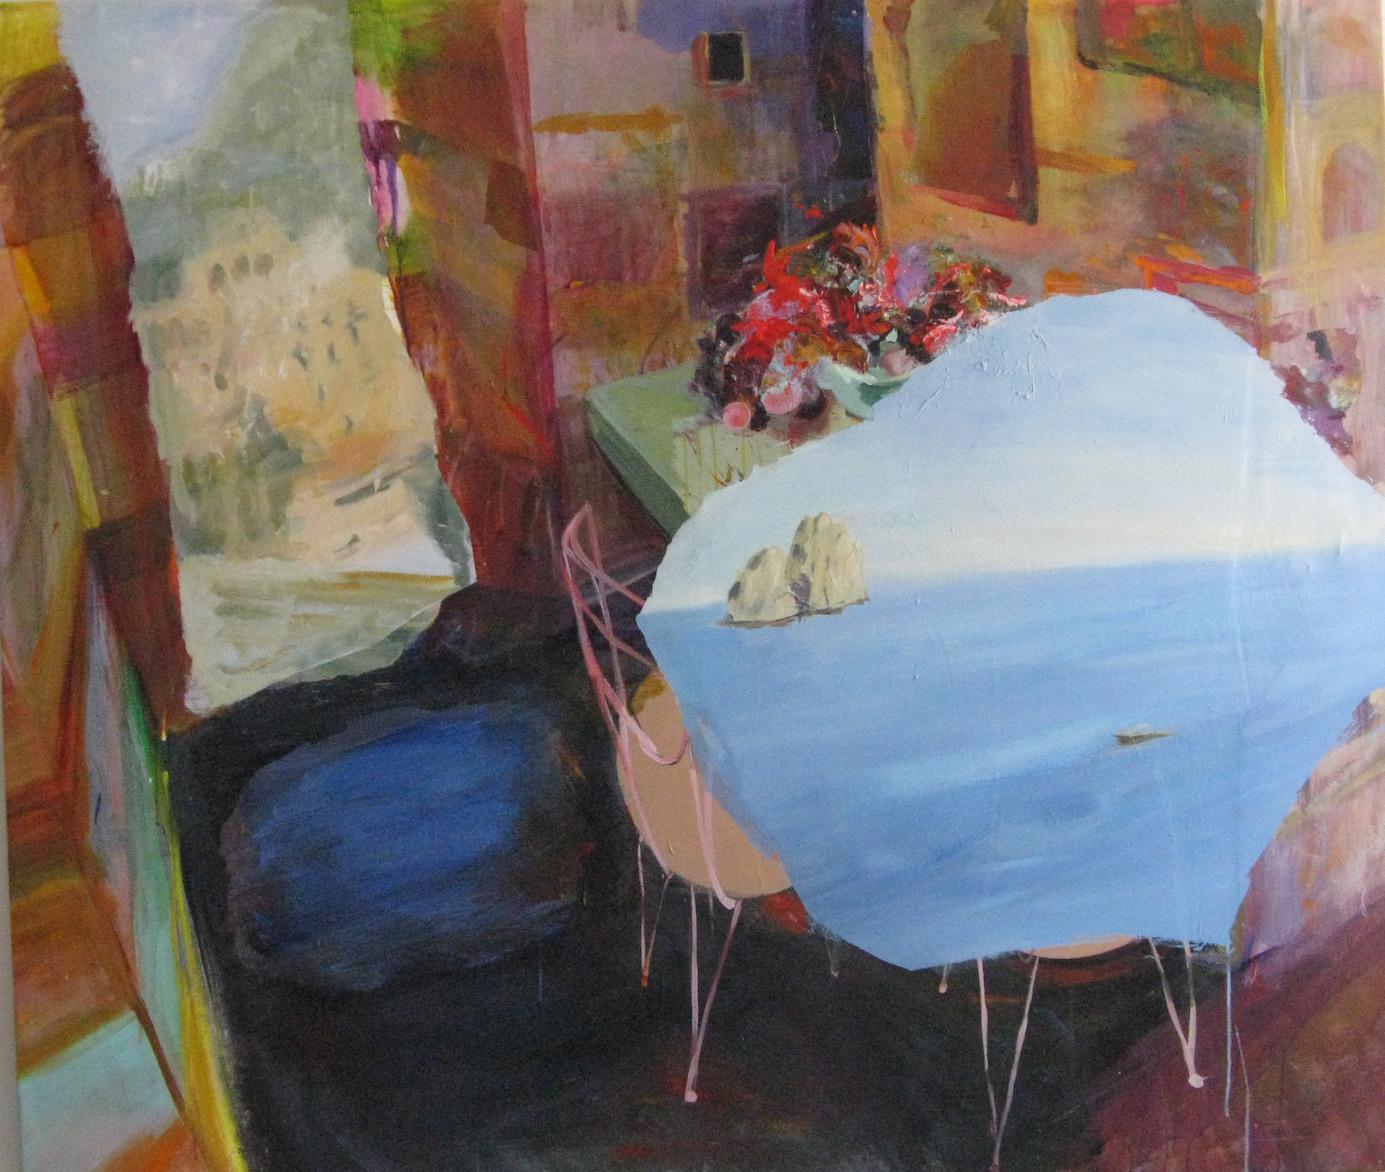 Judith Simonian, Sublet, 2016, acrylic on canvas, 64h x 74w in.